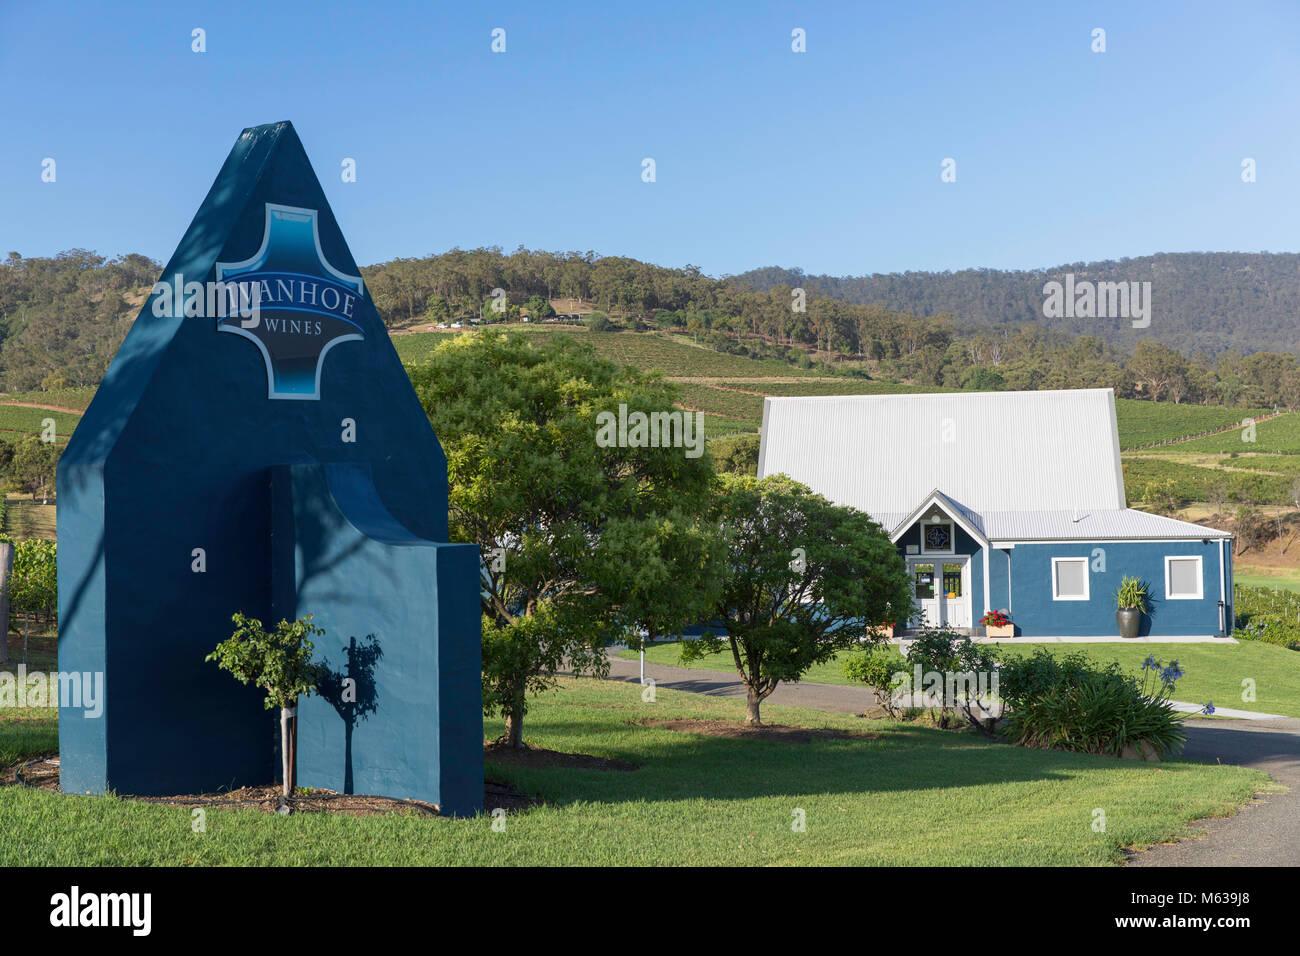 Ivanhoe Wine Estate, Hunter Valley, New South Wales, Australia - Stock Image